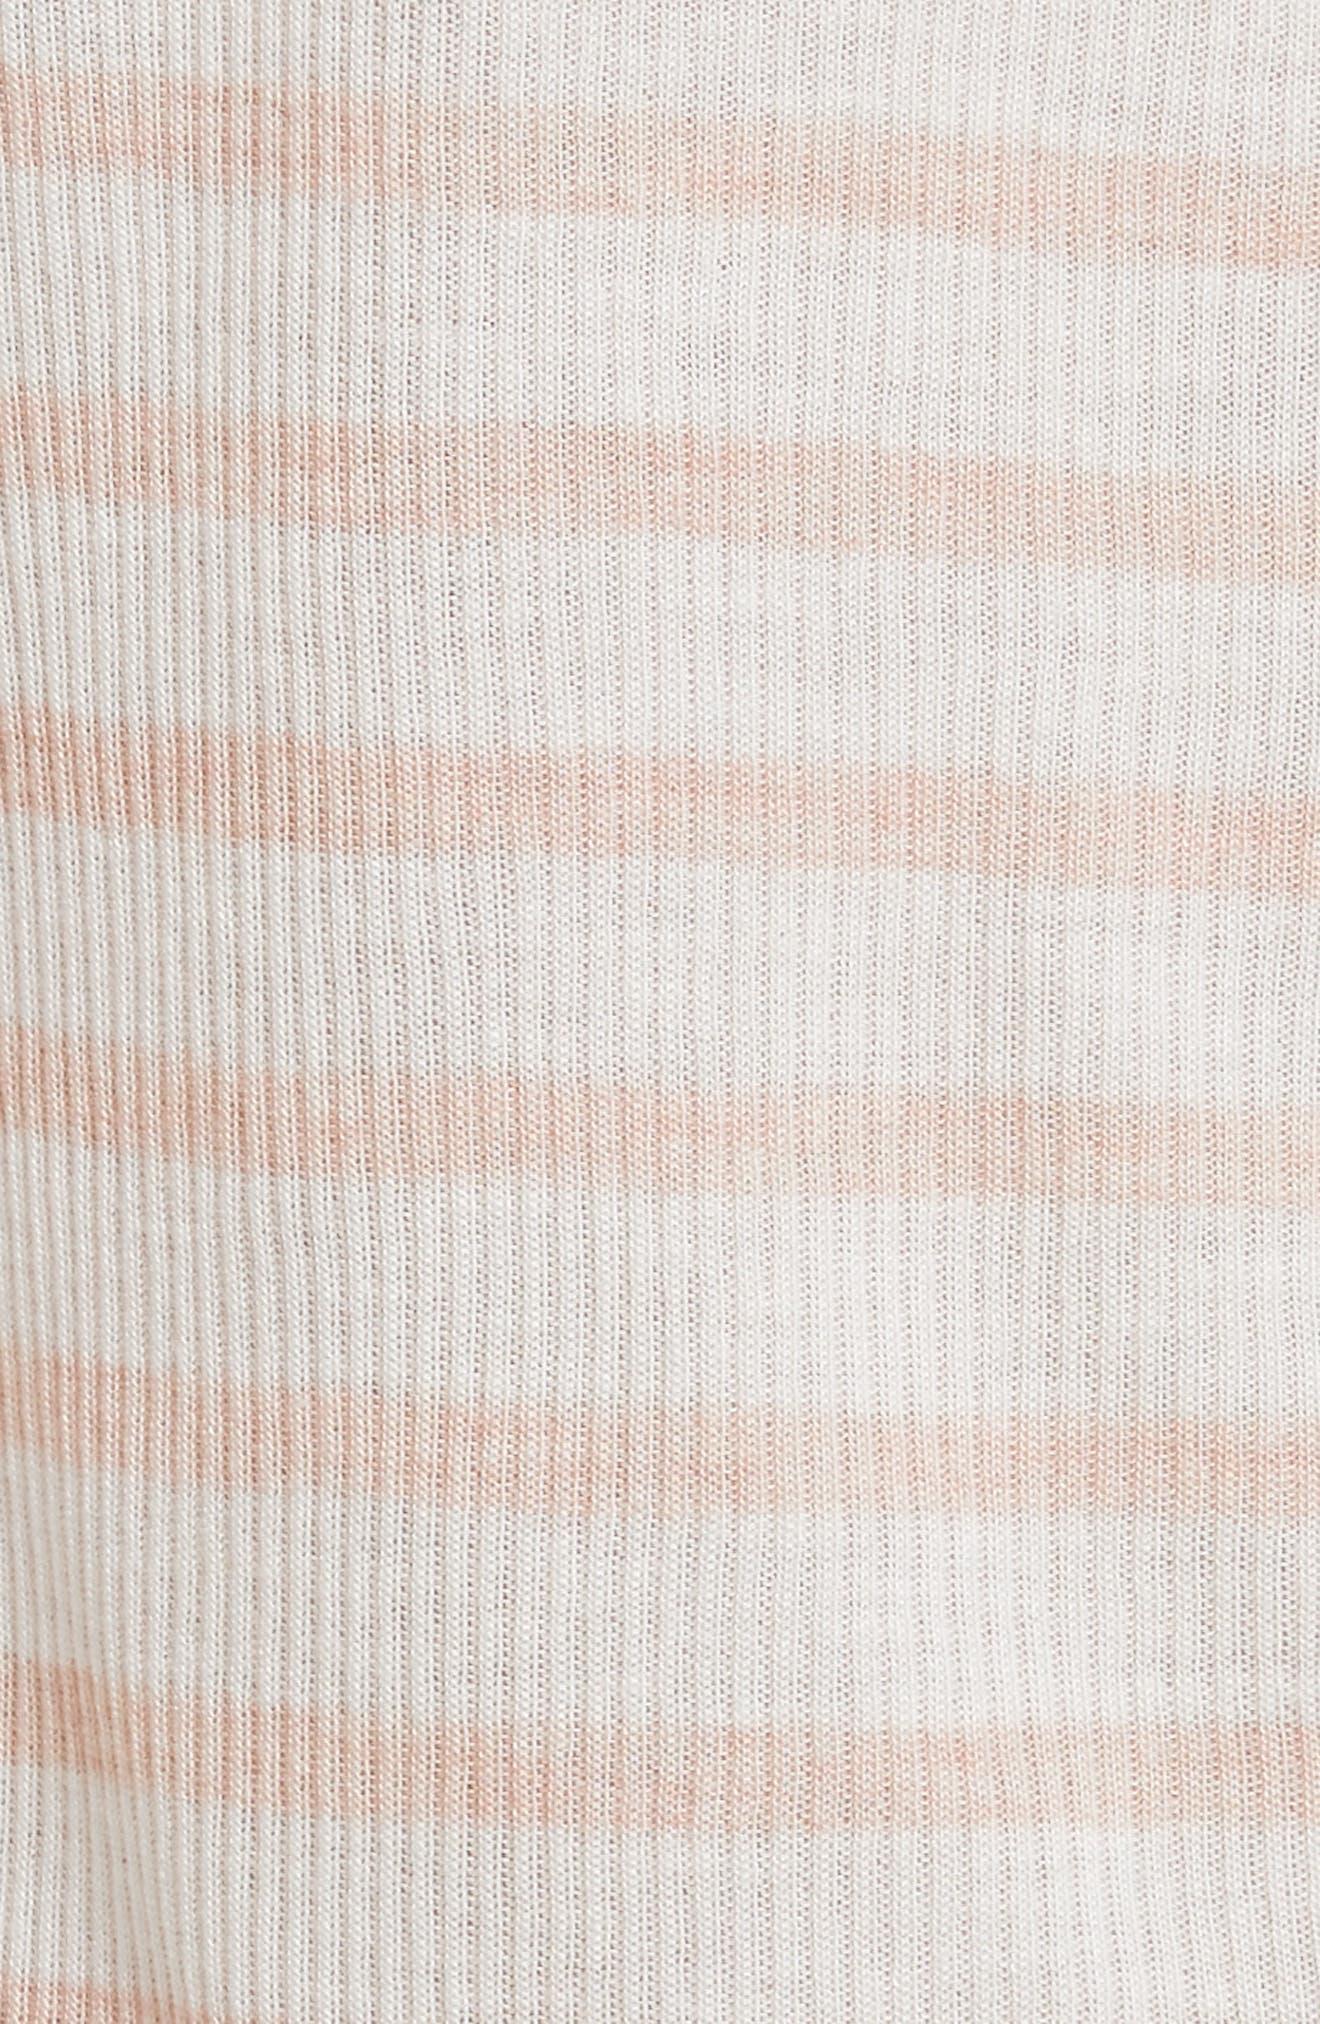 Madison Stripe Long Sleeve Top,                             Alternate thumbnail 5, color,                             900